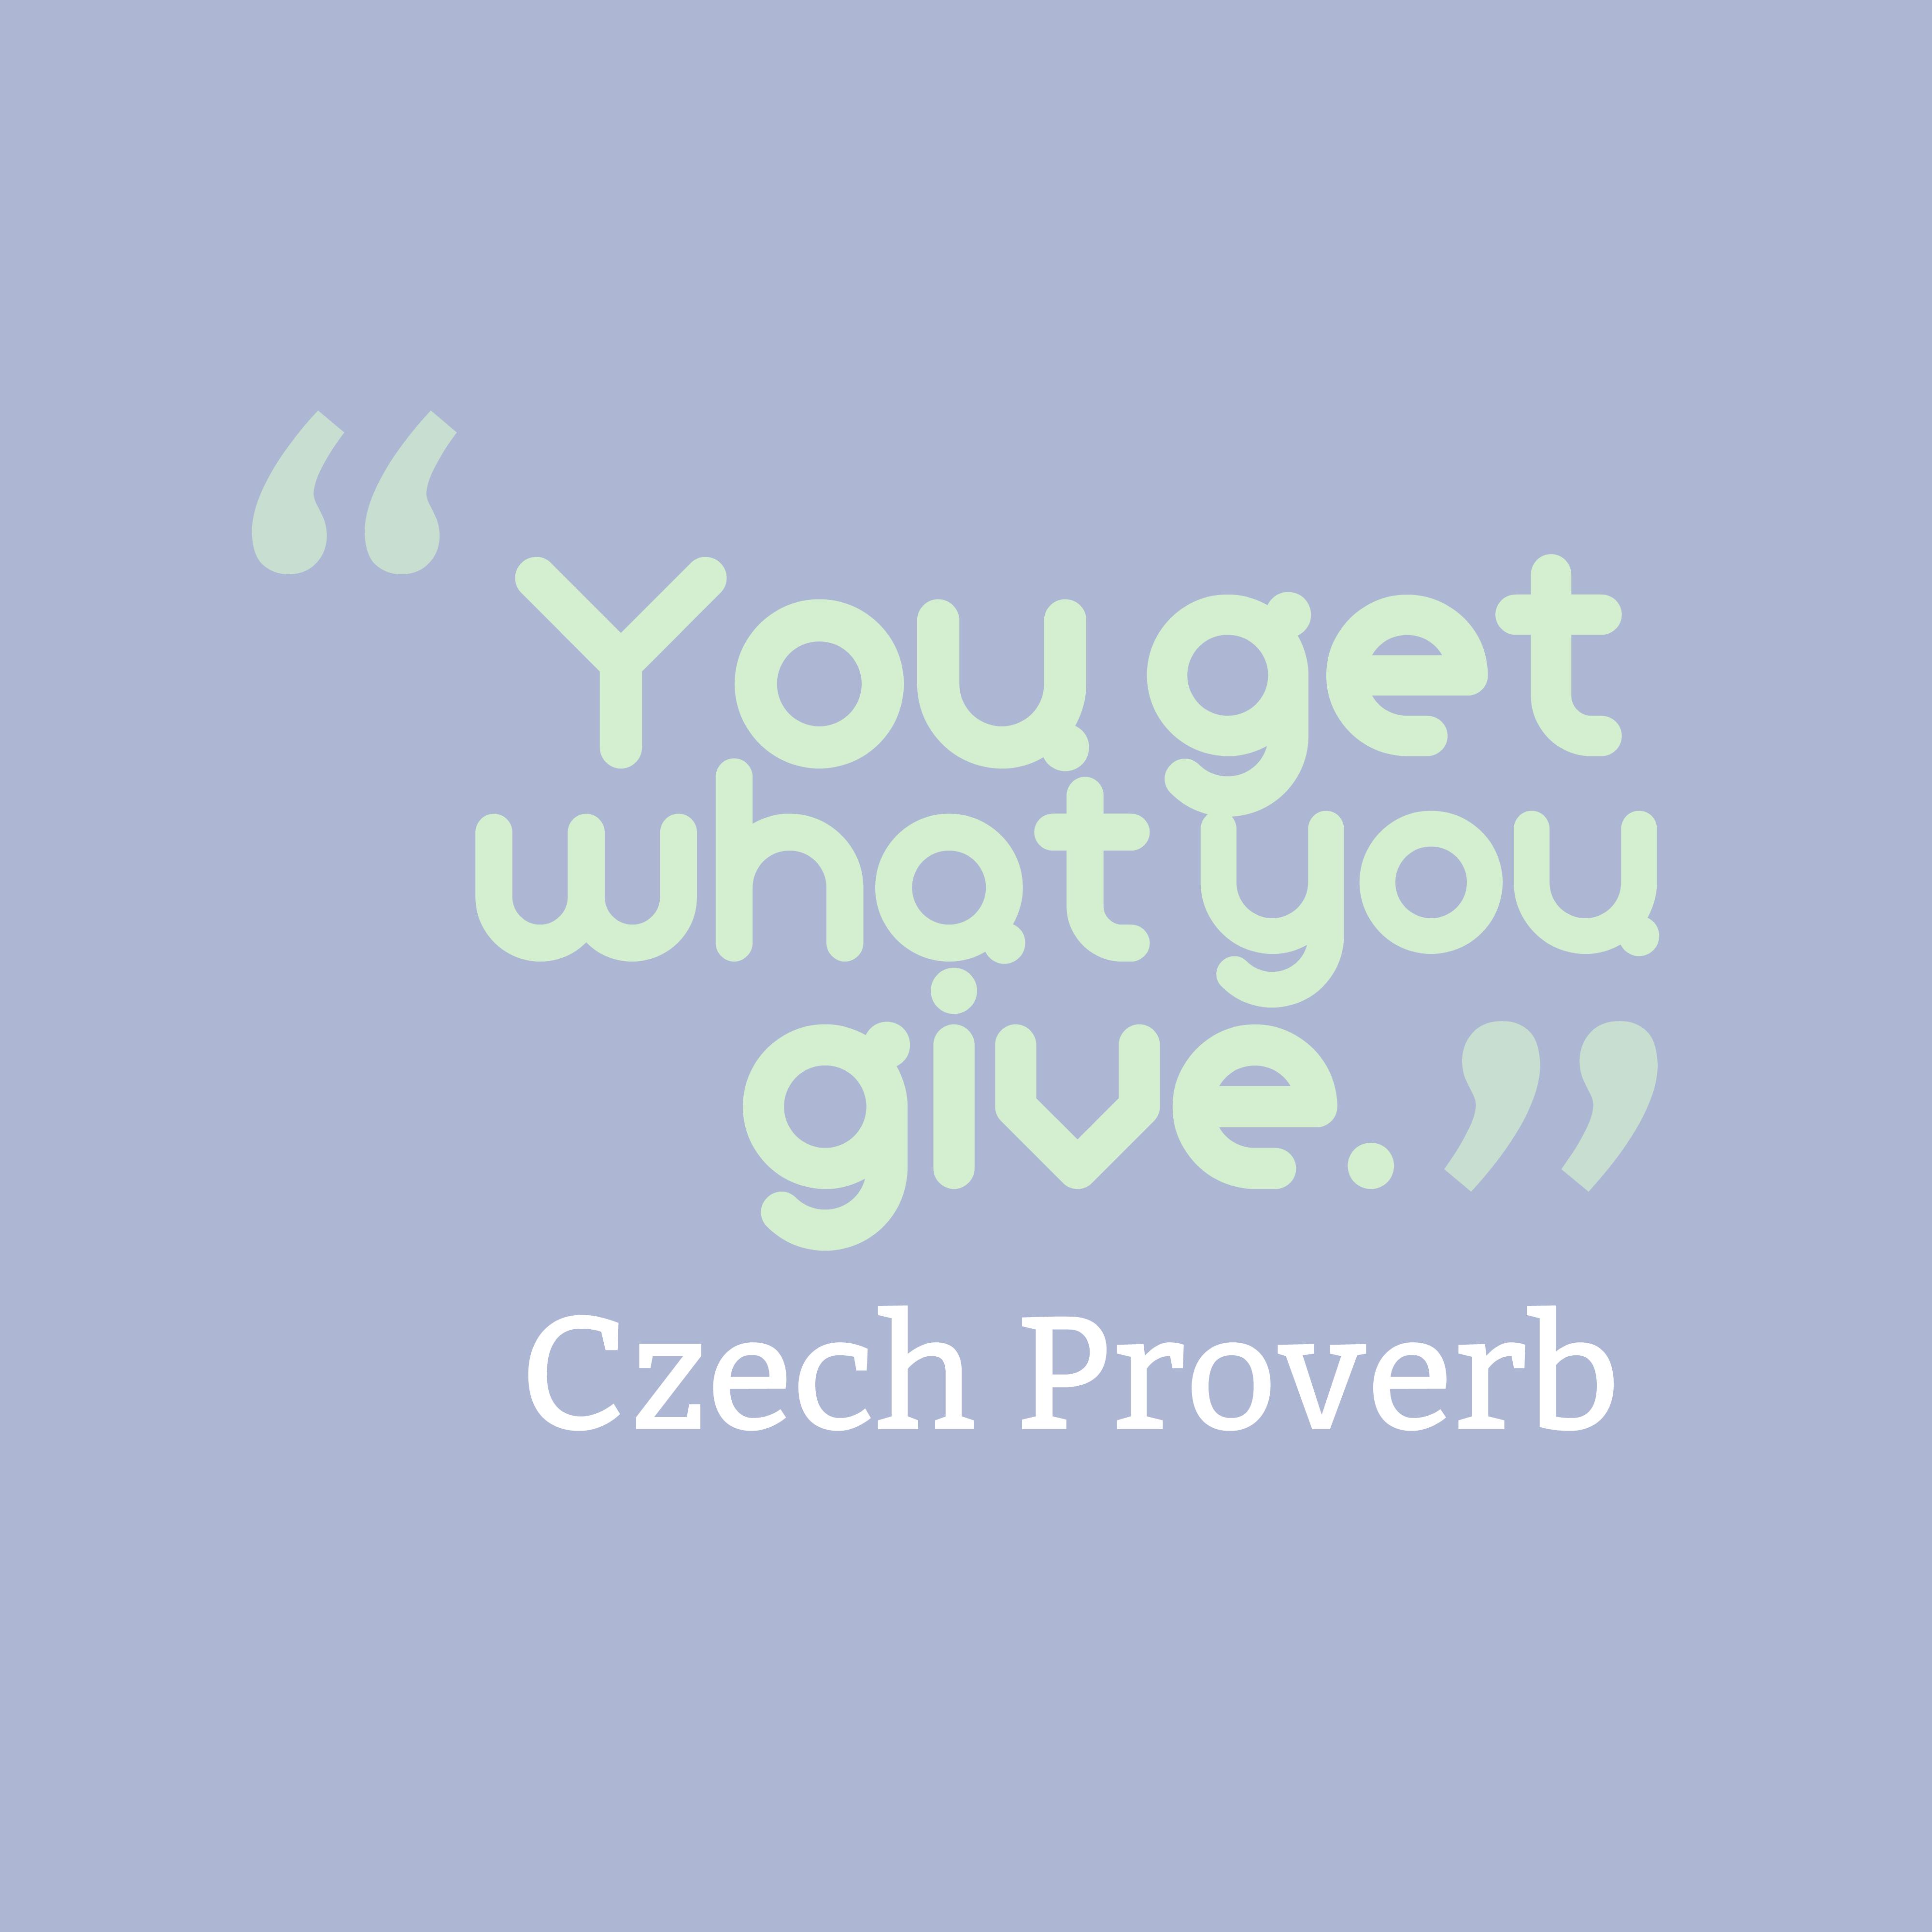 Czech Wisdom About Equally